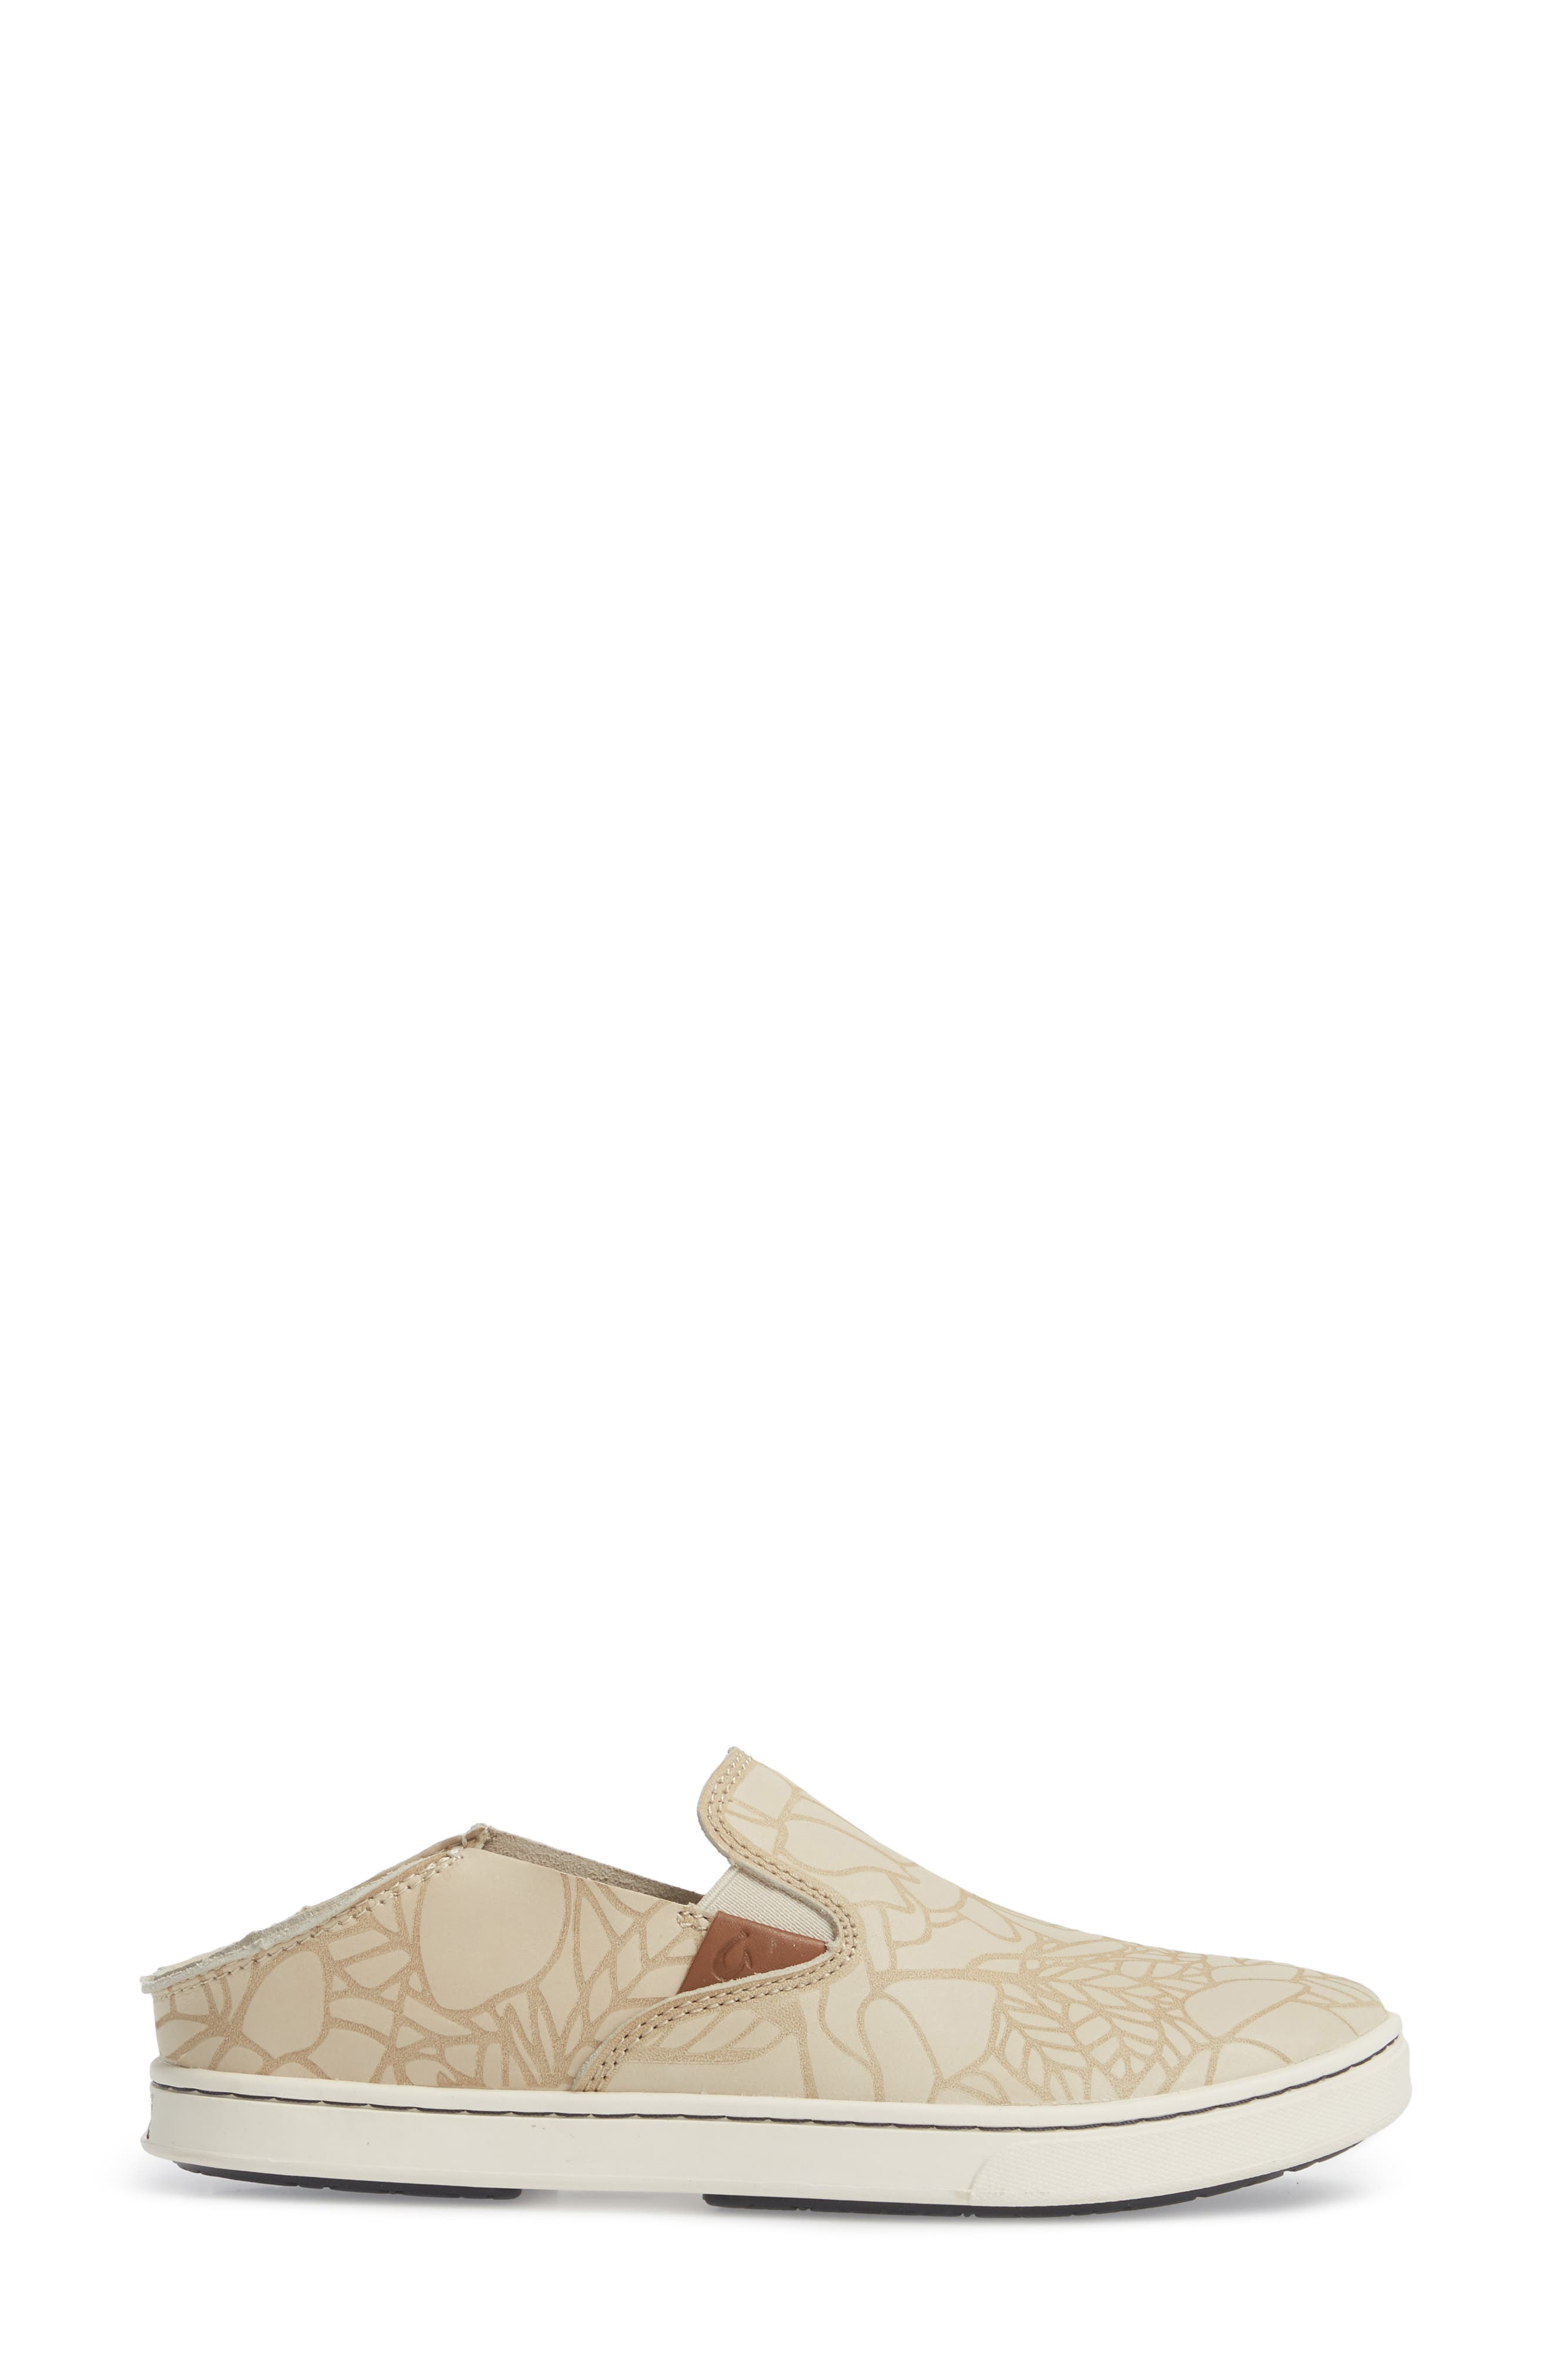 Pehuea Lau Slip-On Sneaker,                             Alternate thumbnail 4, color,                             TAPA/ TAPA FABRIC